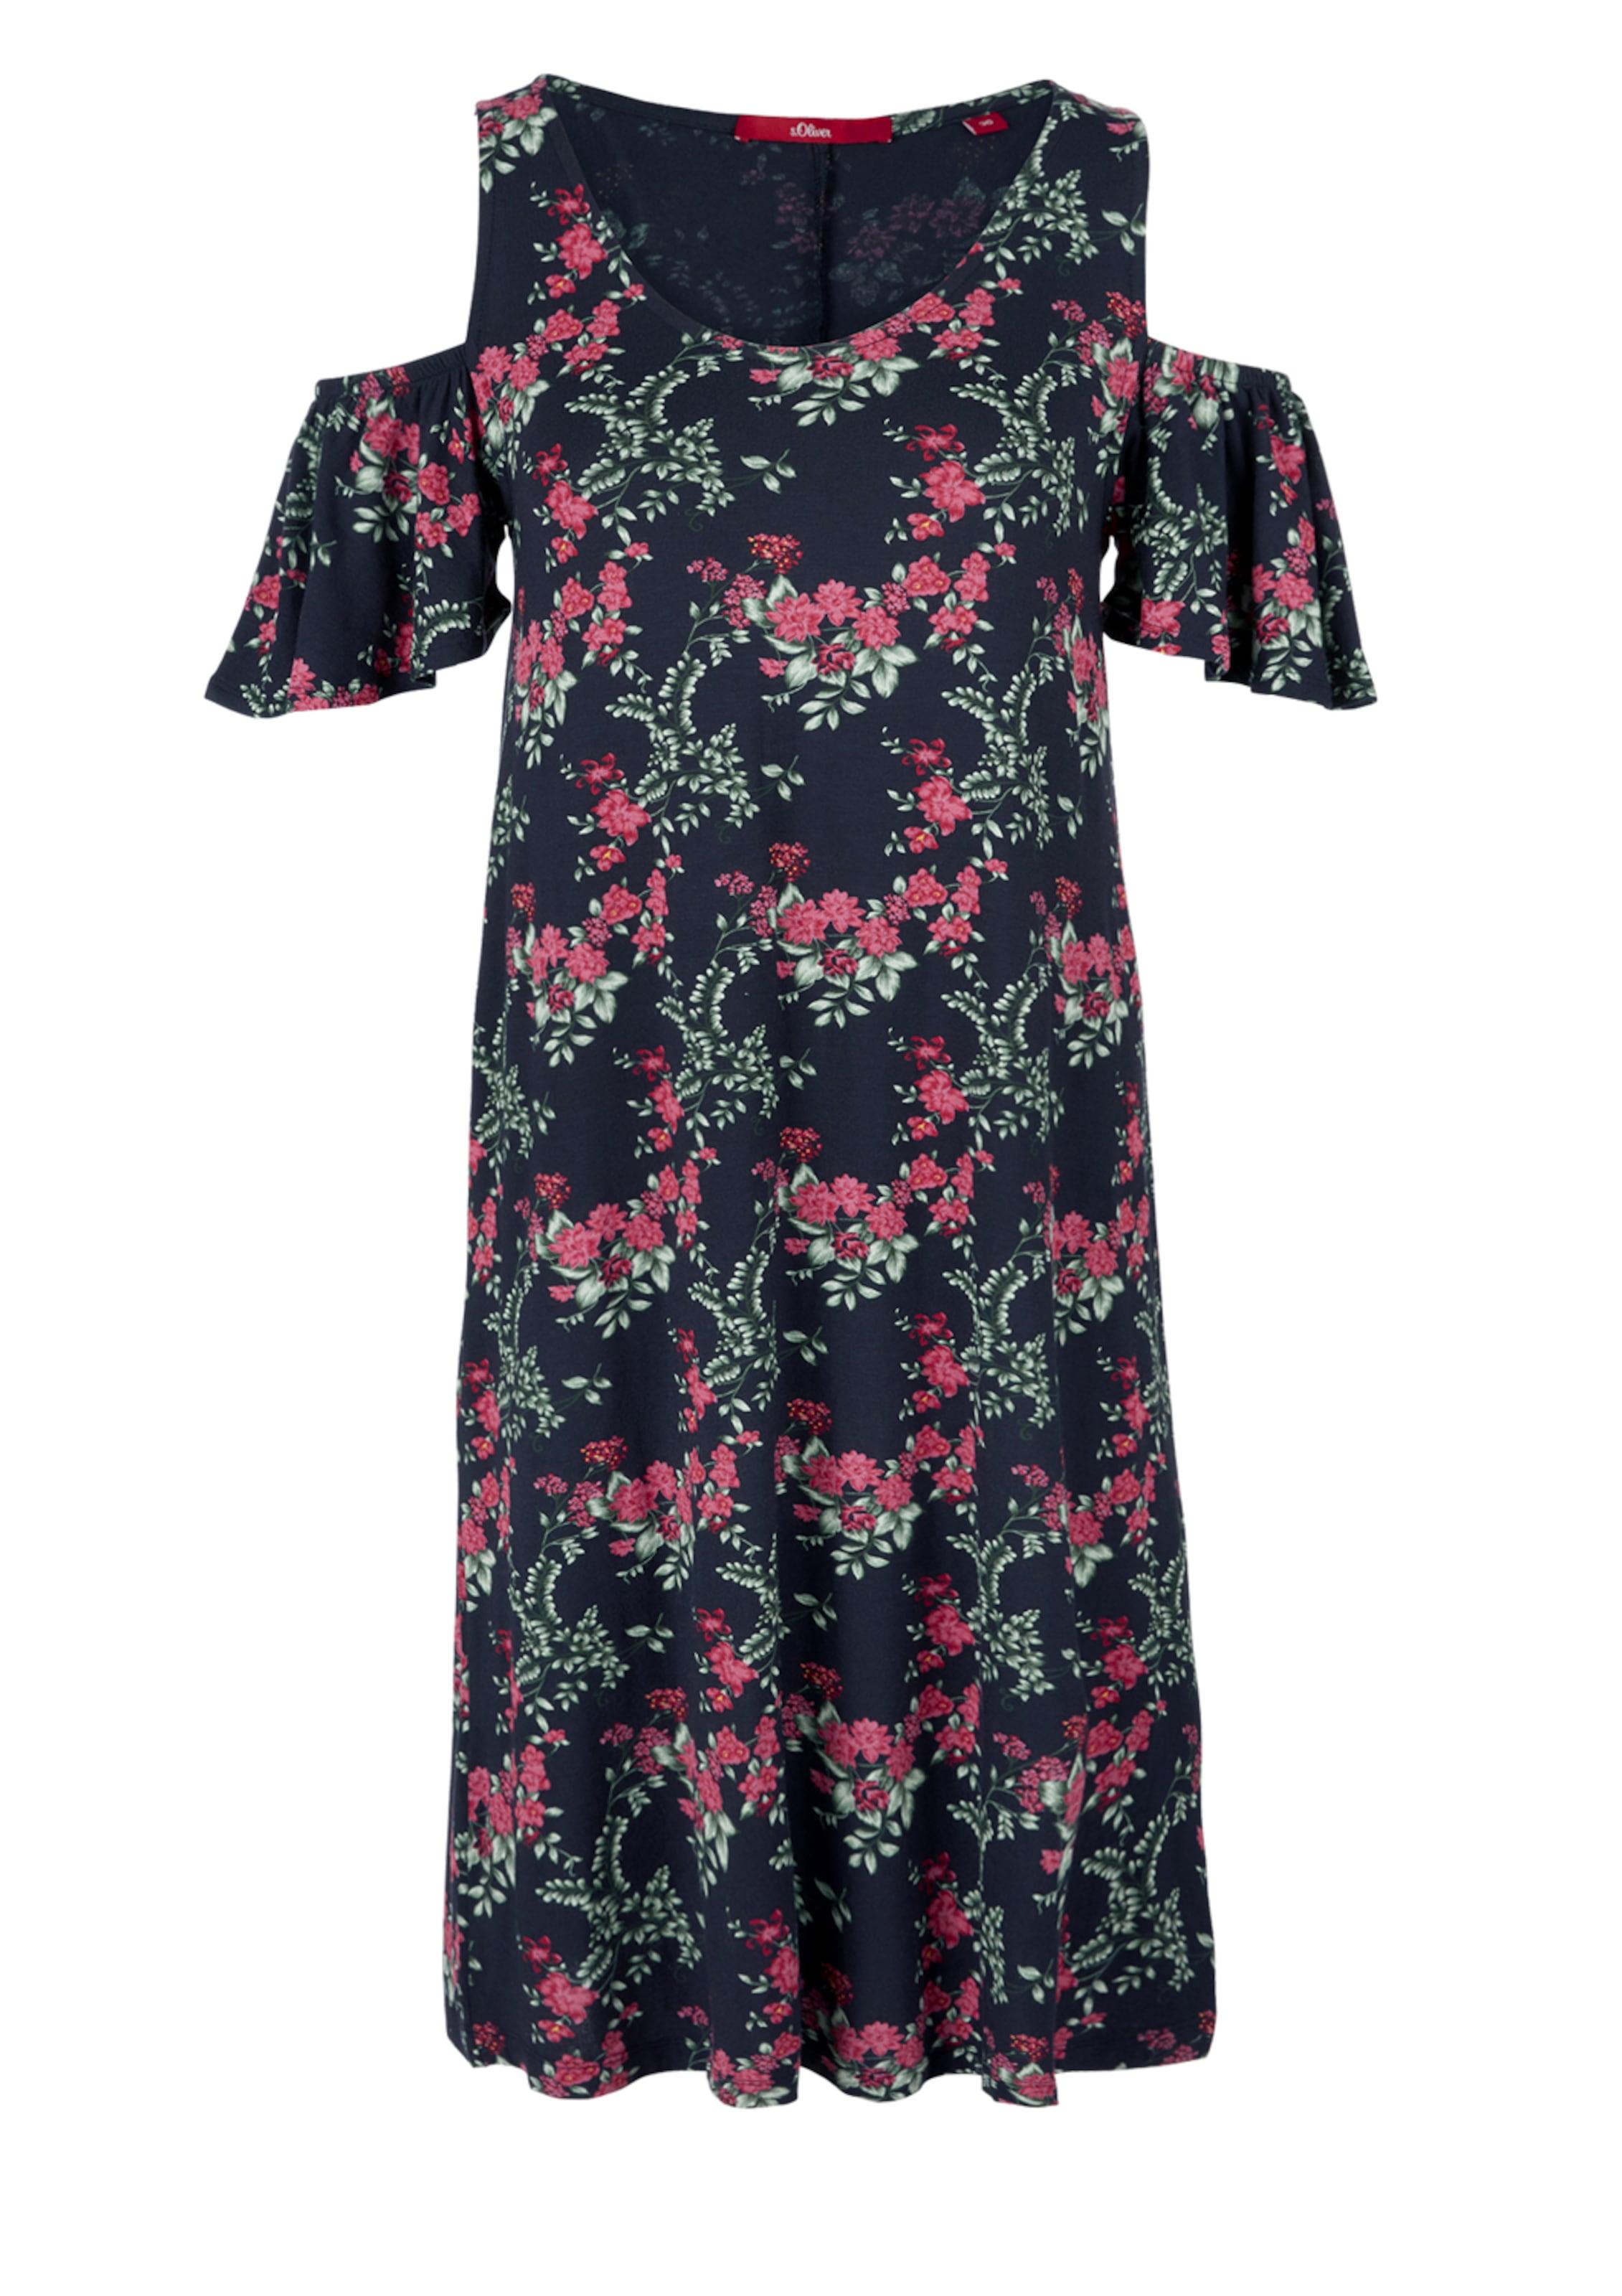 Kleid In DunkelblauHellgrün Pink S oliver Red Label K1lJcuTF3